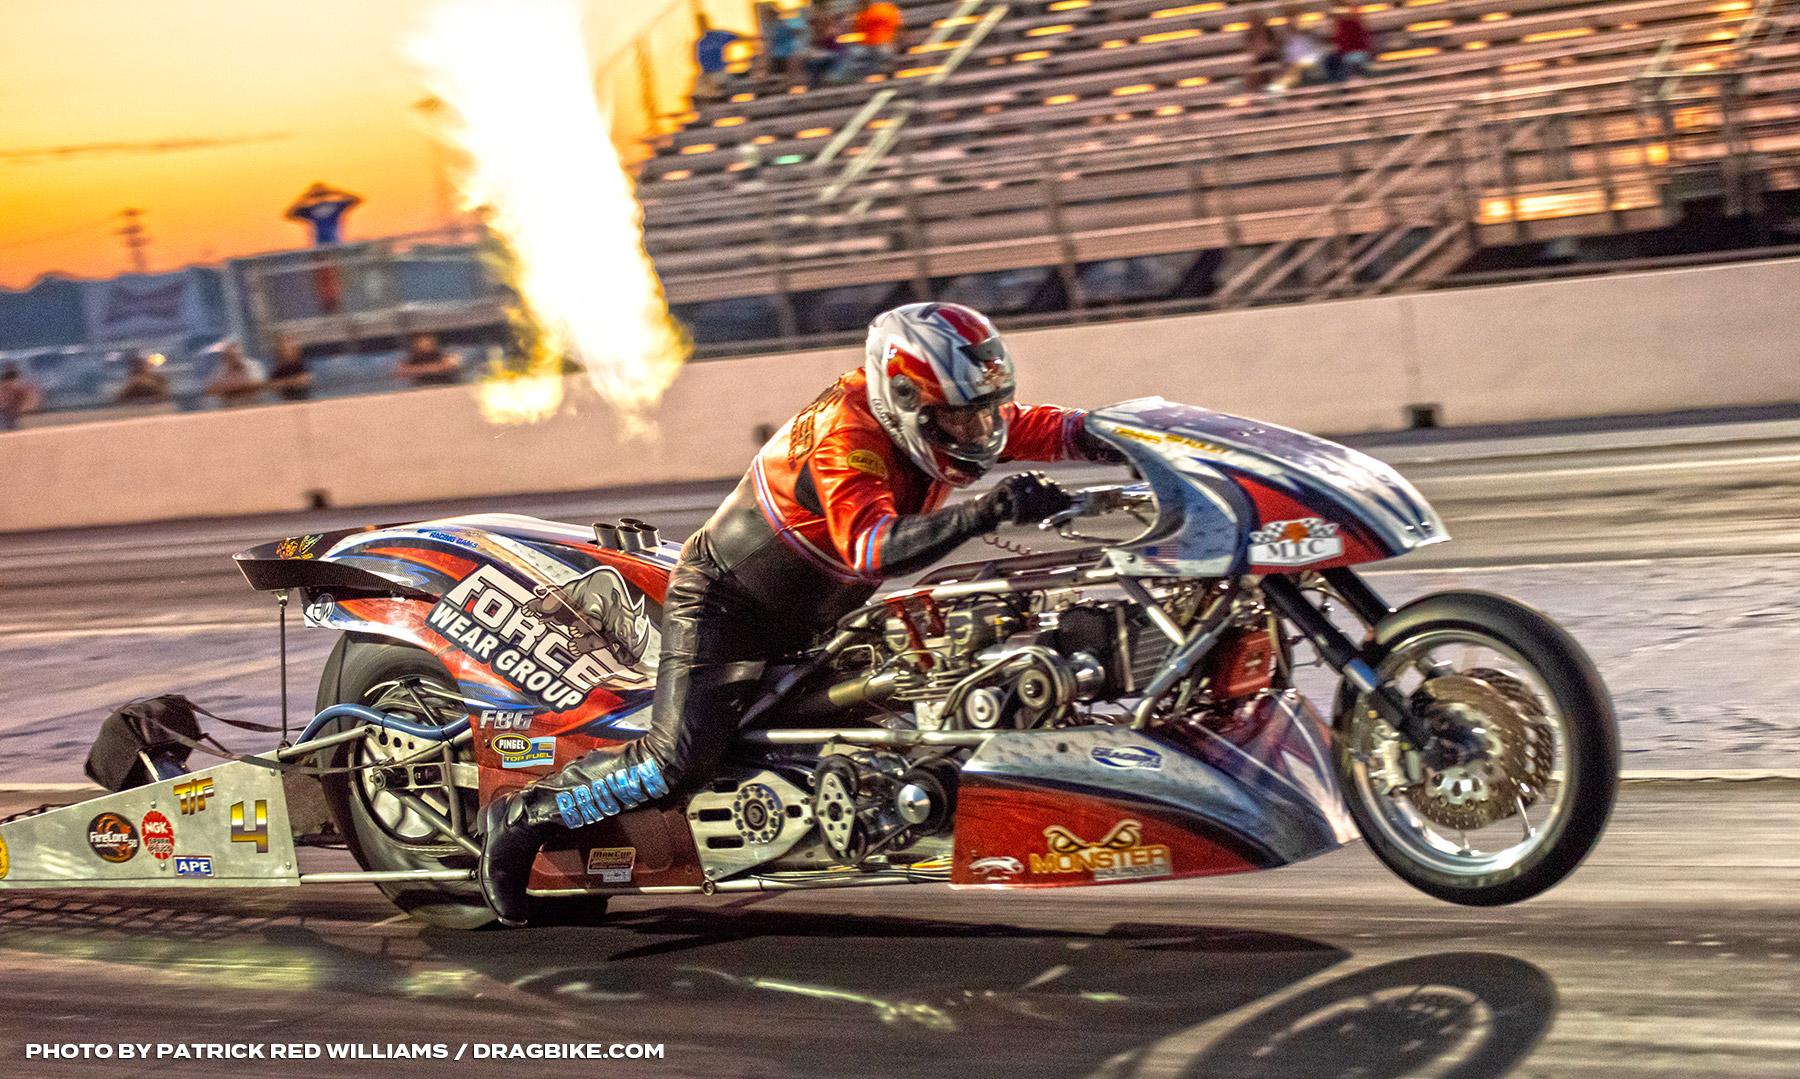 2020 Mitch Brown Top Fuel Motorcycle Drag Racing